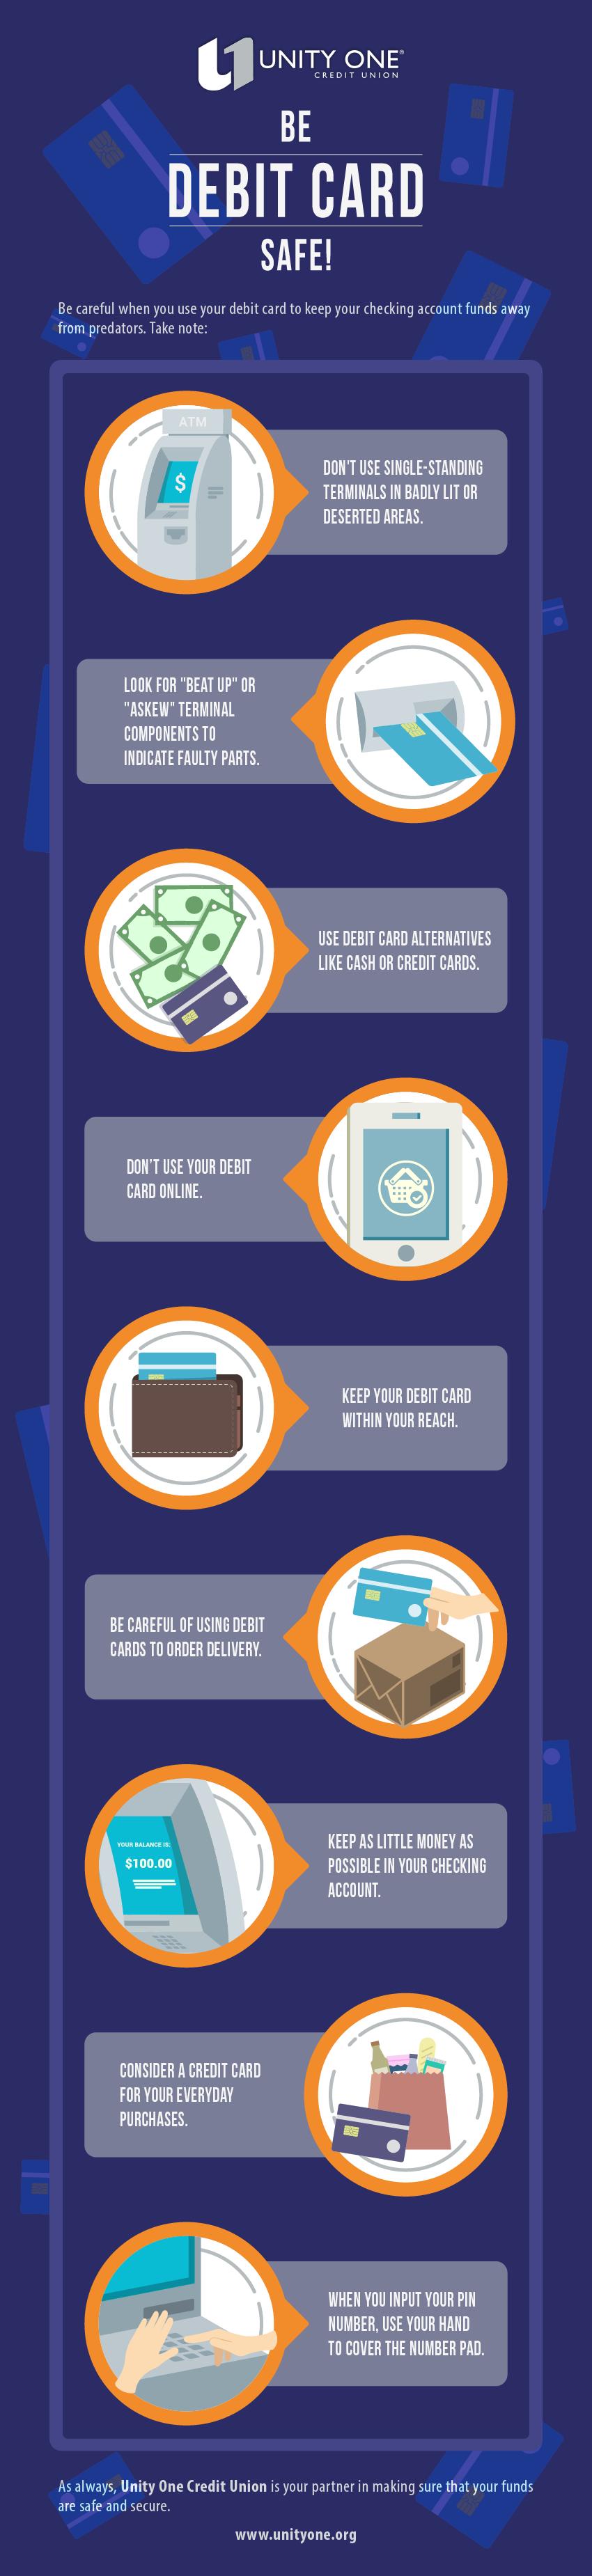 unity one debitcard infographic